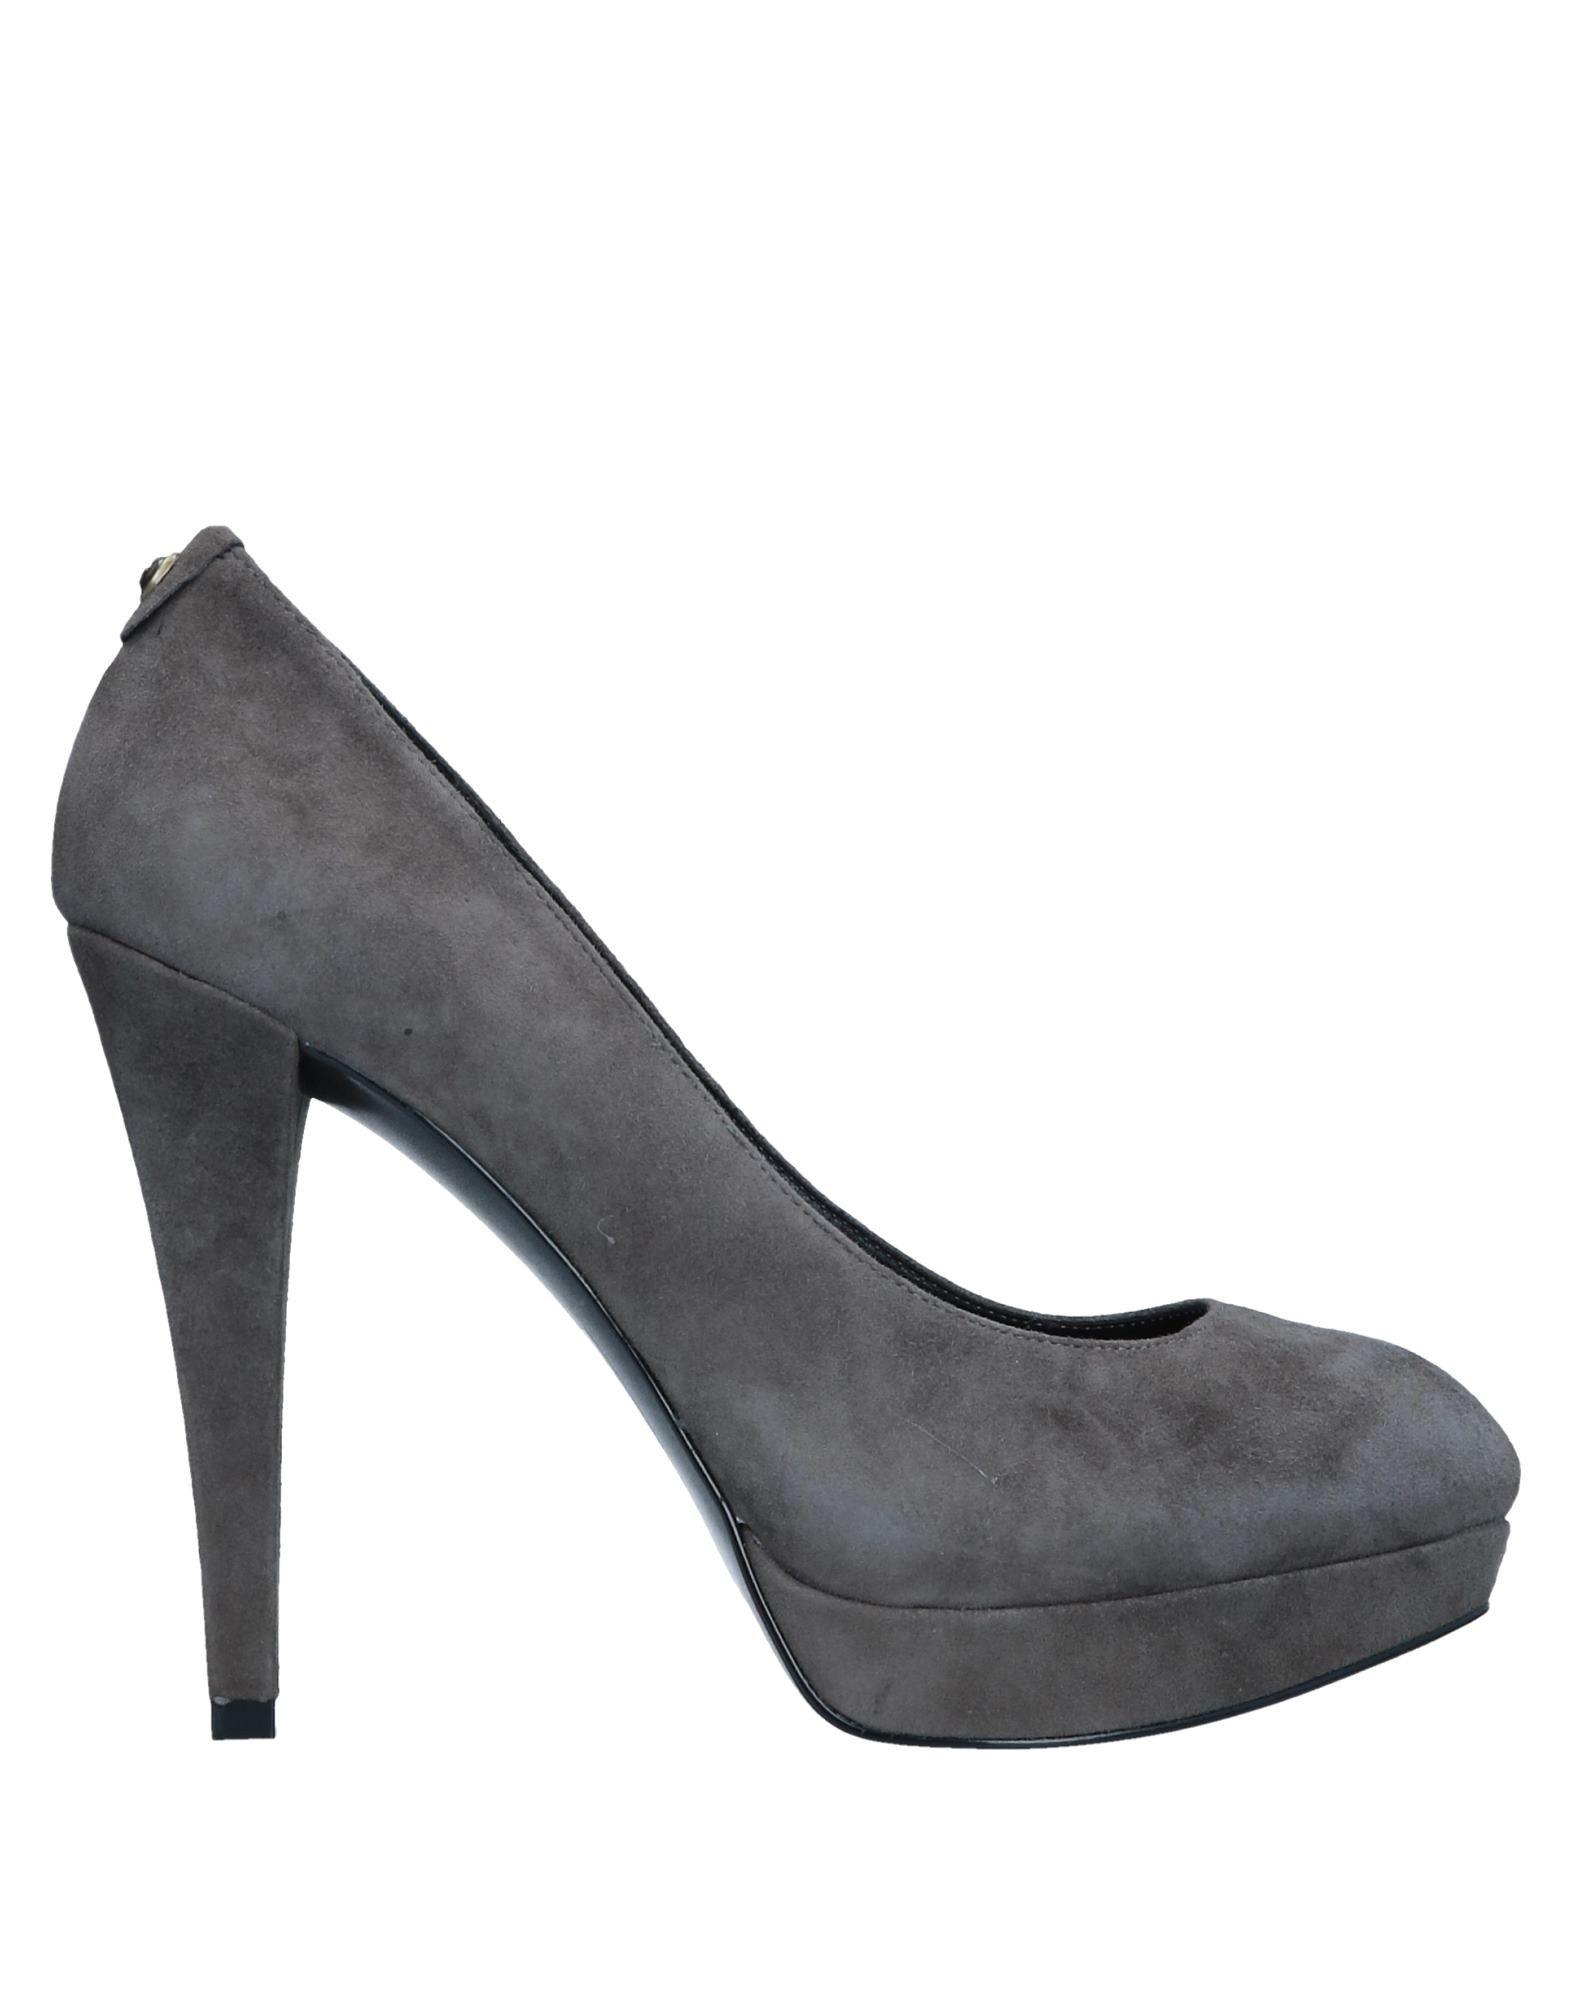 Mocassino Romagnoli offerte Donna - 11512496OM Nuove offerte Romagnoli e scarpe comode e91e31